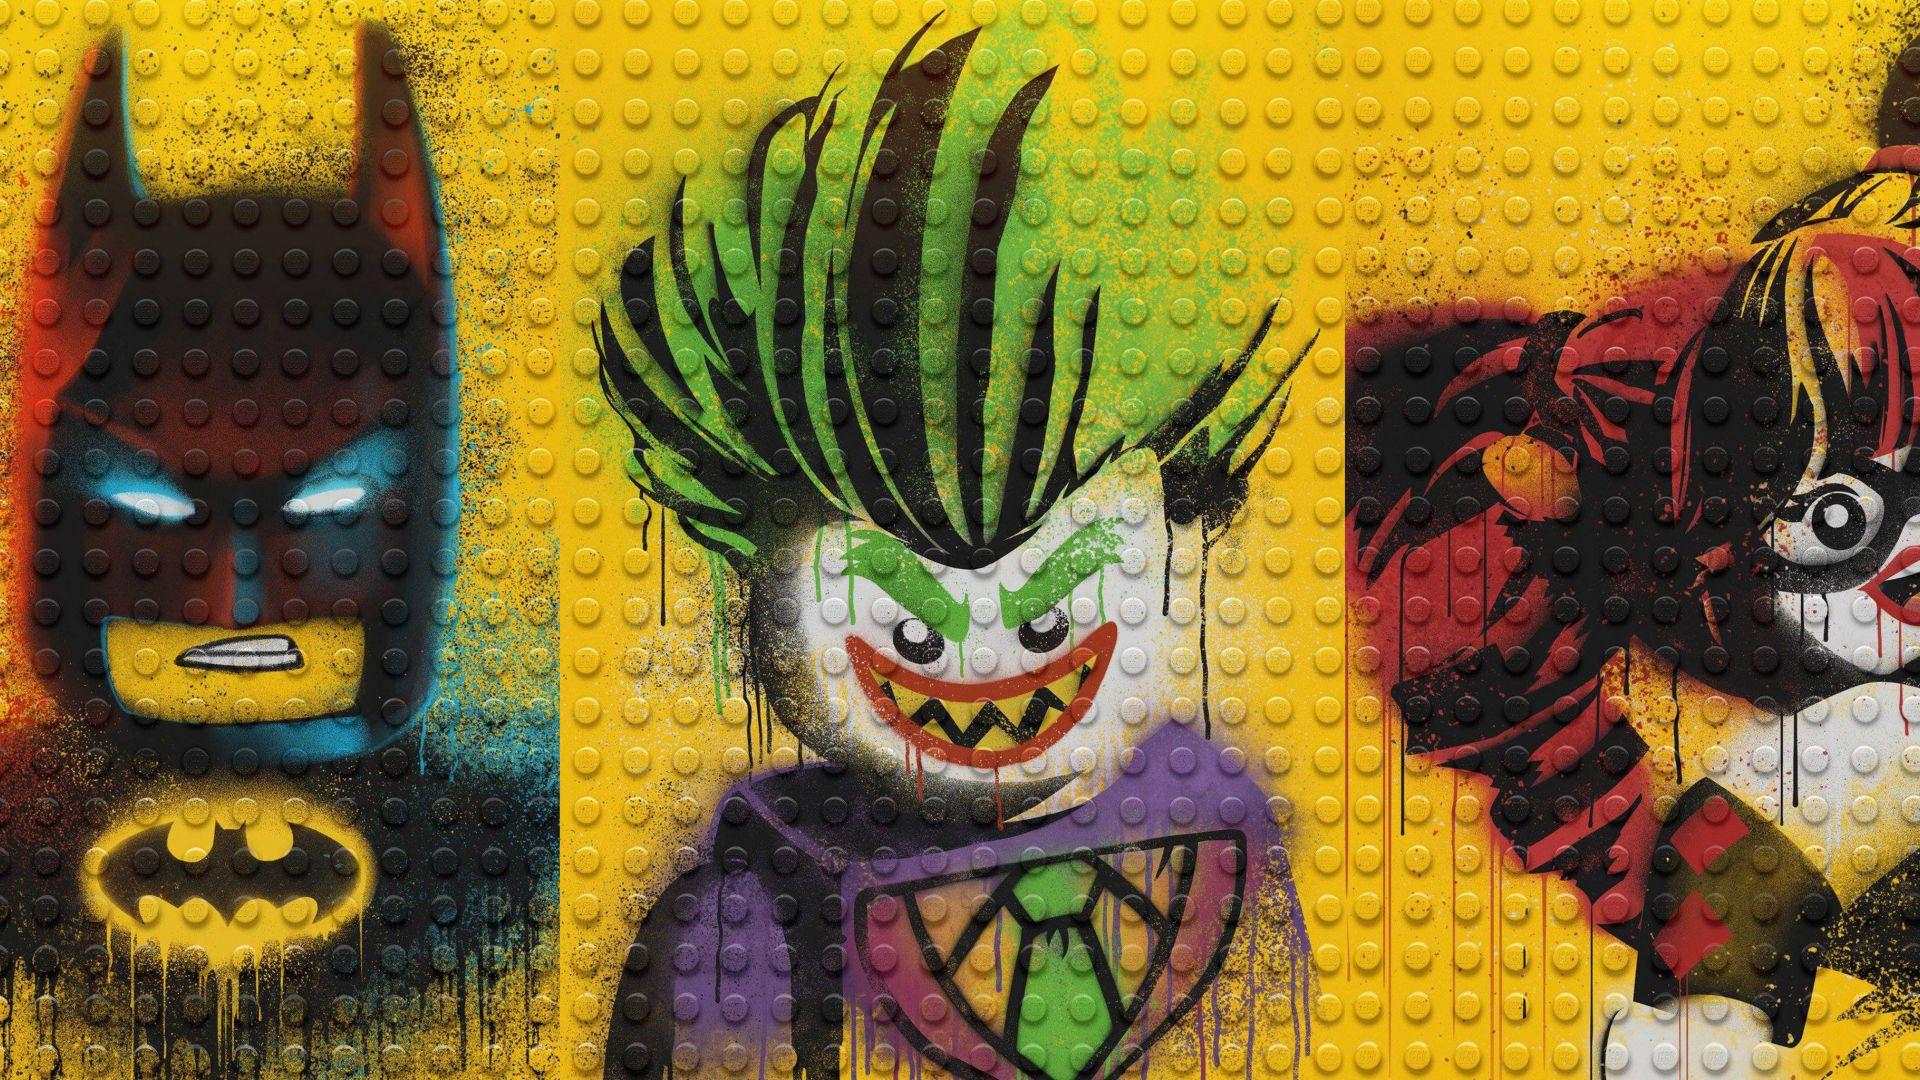 Wallpaper The lego batman, harley quinn and joker